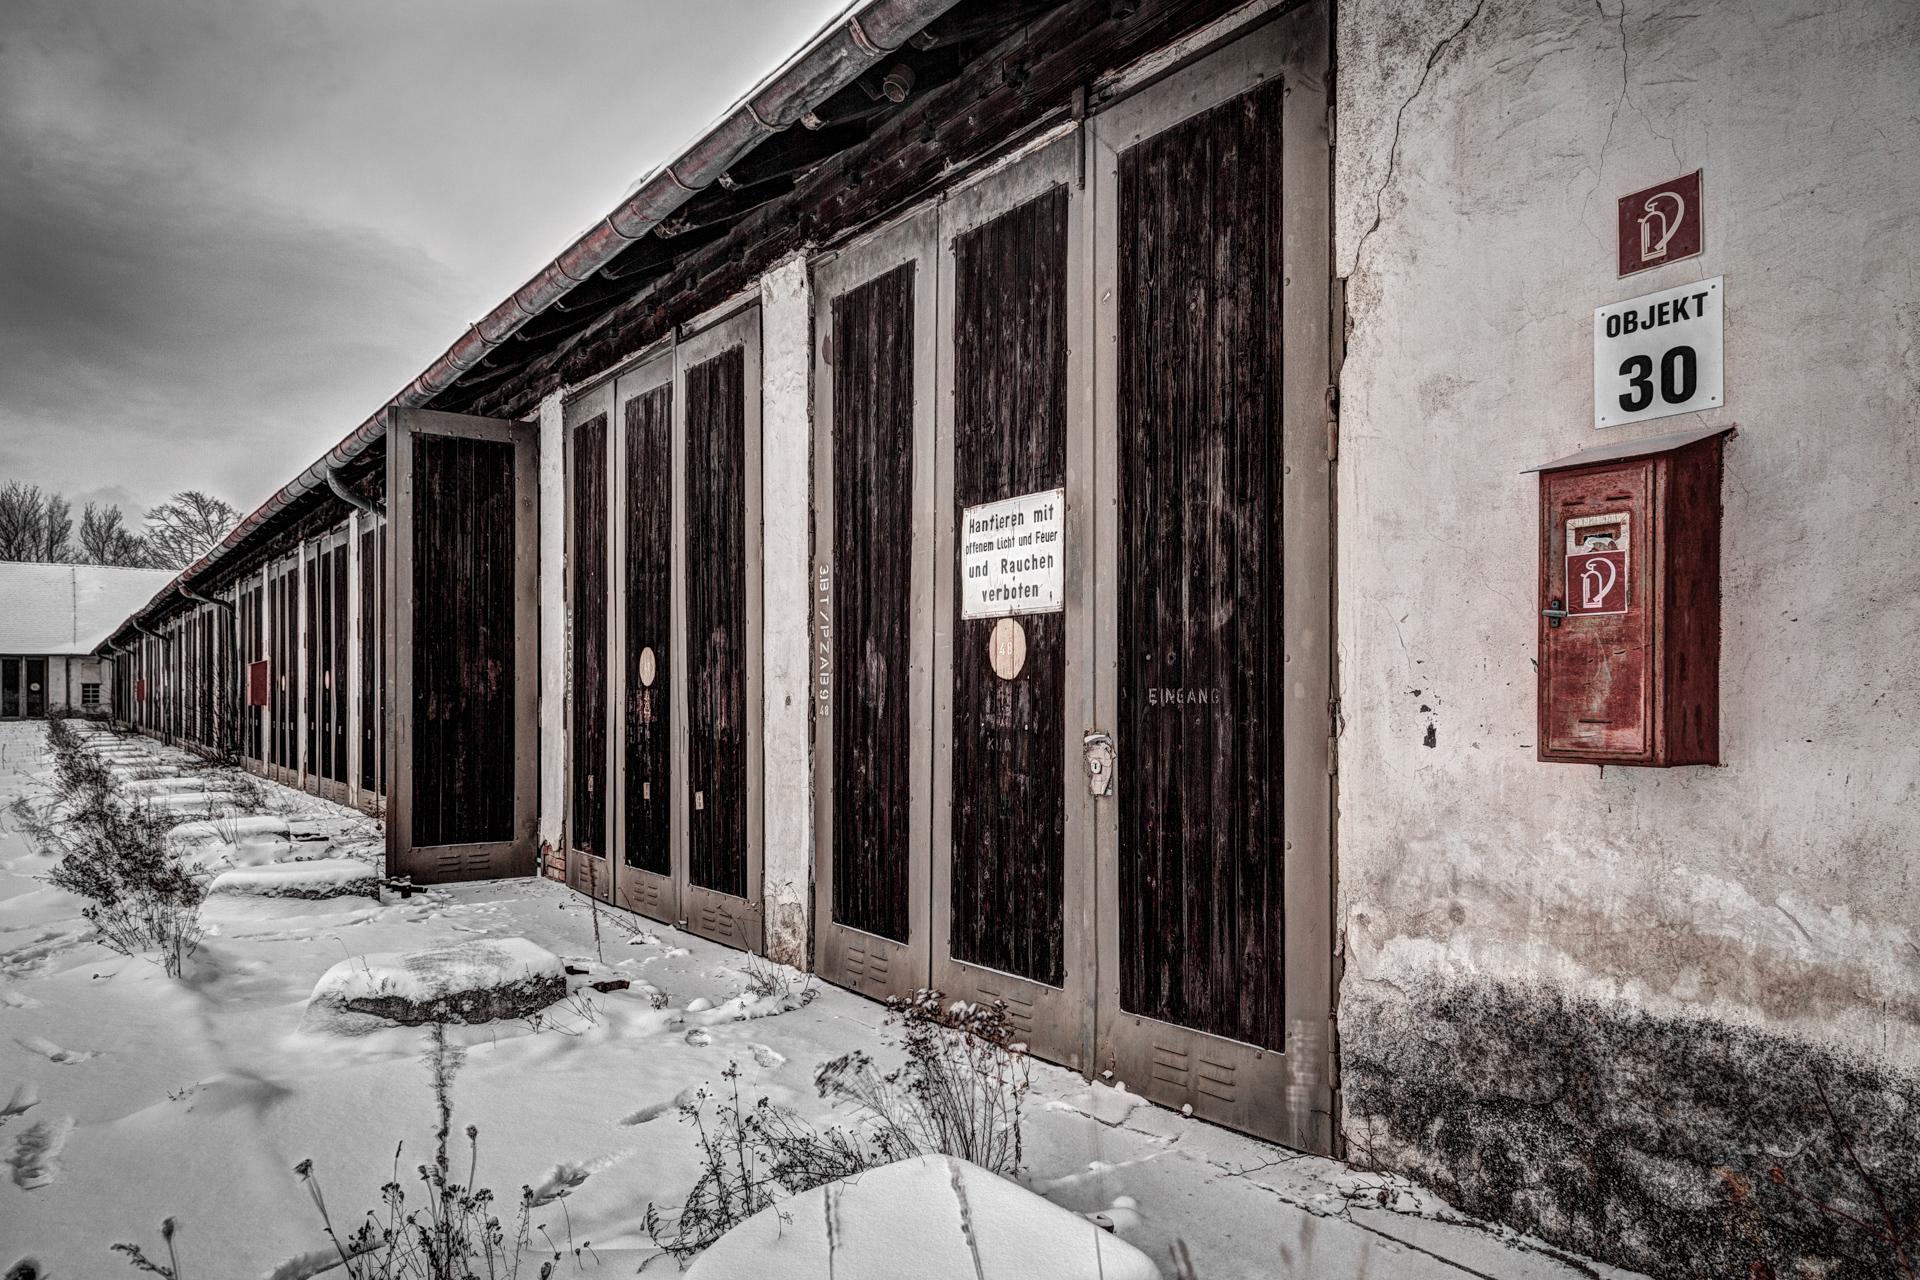 Urban Exploration - Cold Casern - Objekt 30